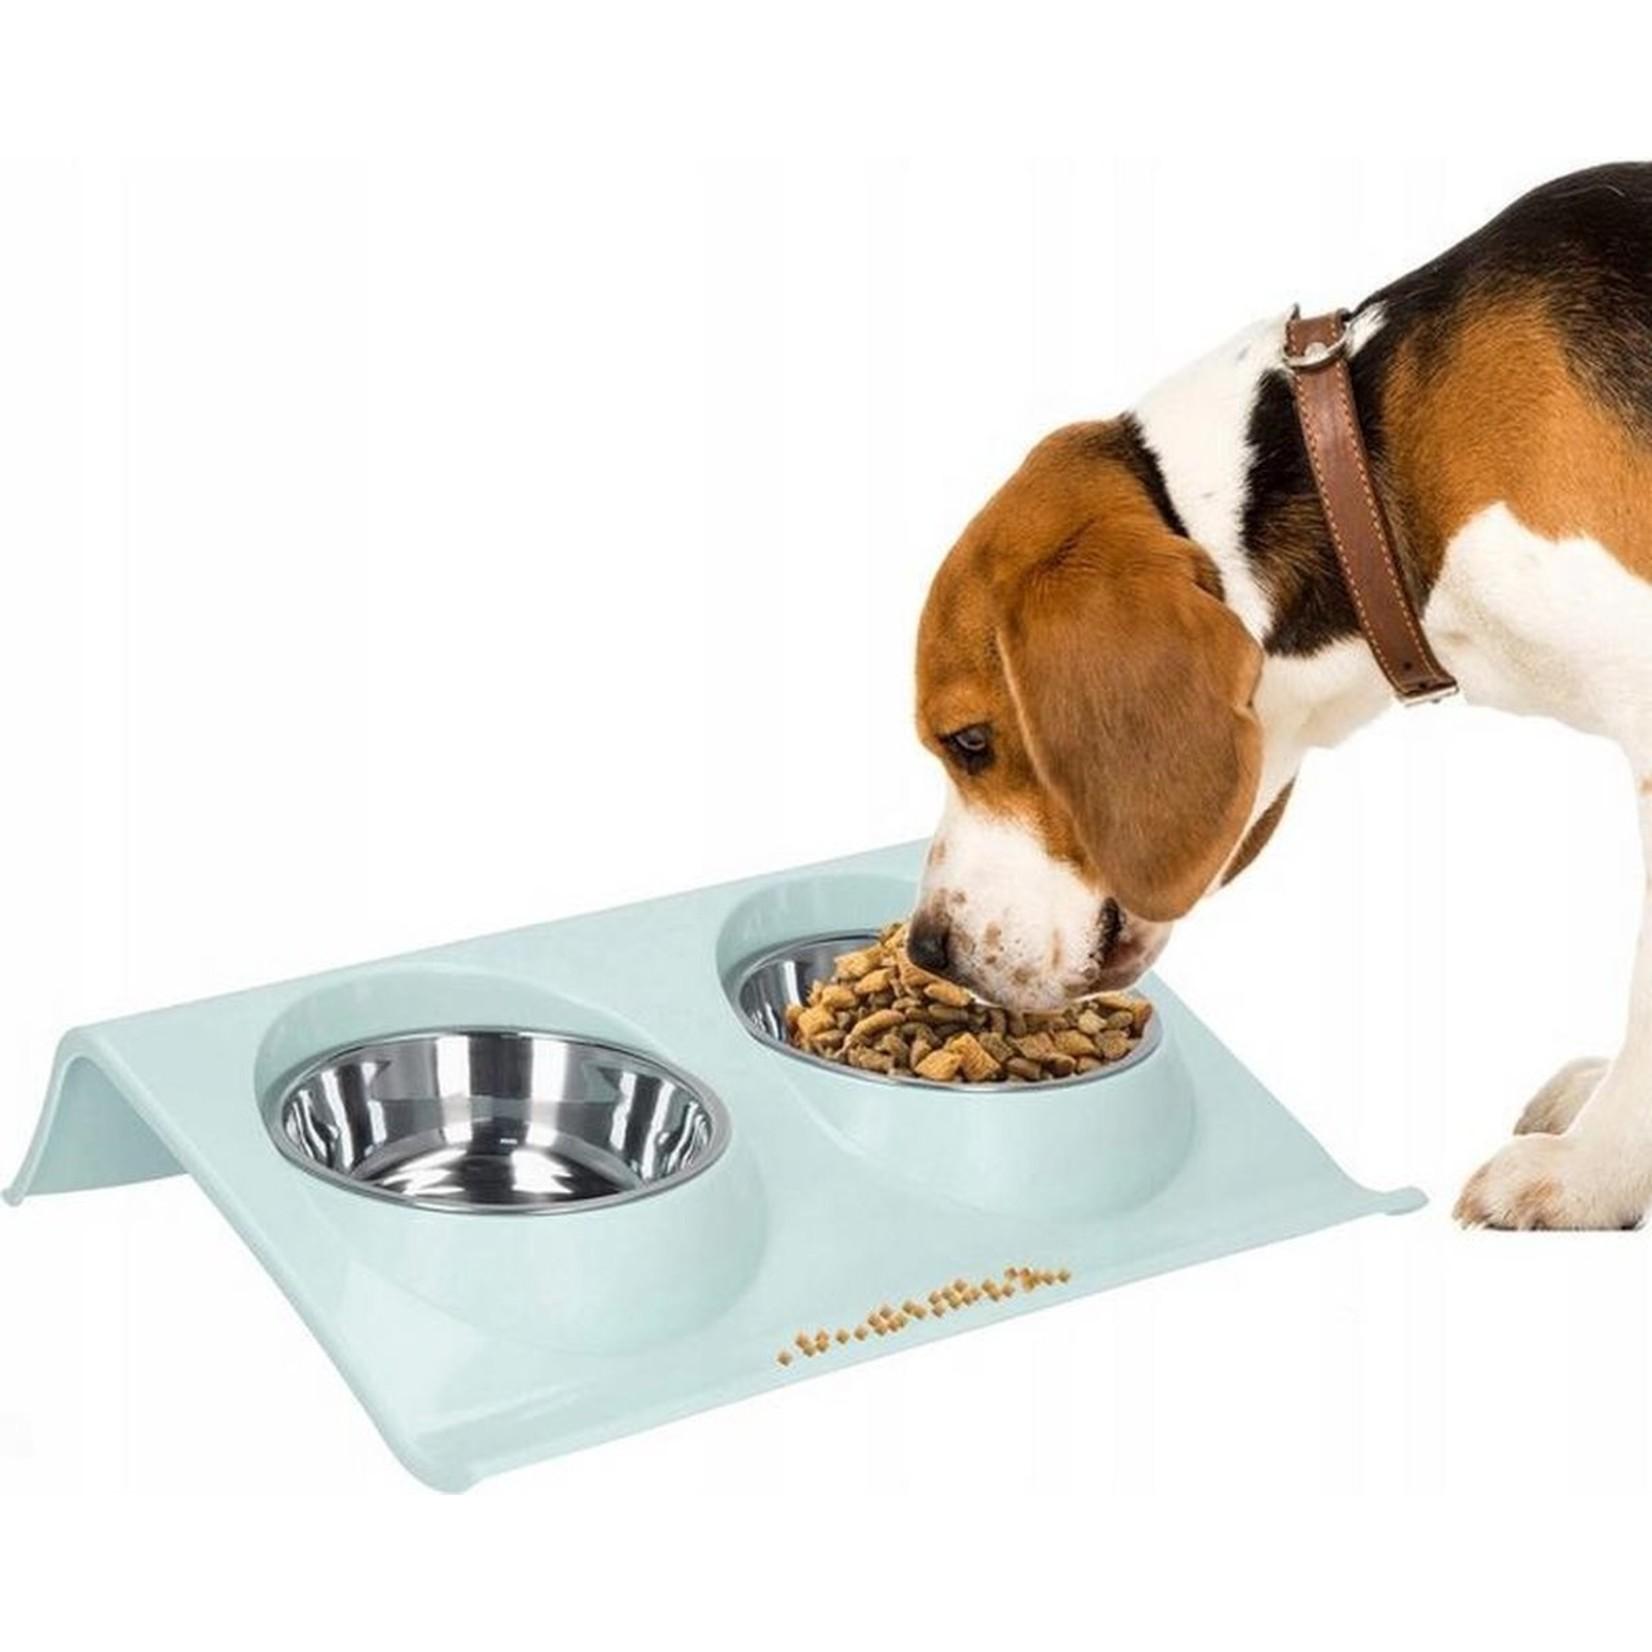 Dubbele  voer-drinkbak katten / honden. RVS